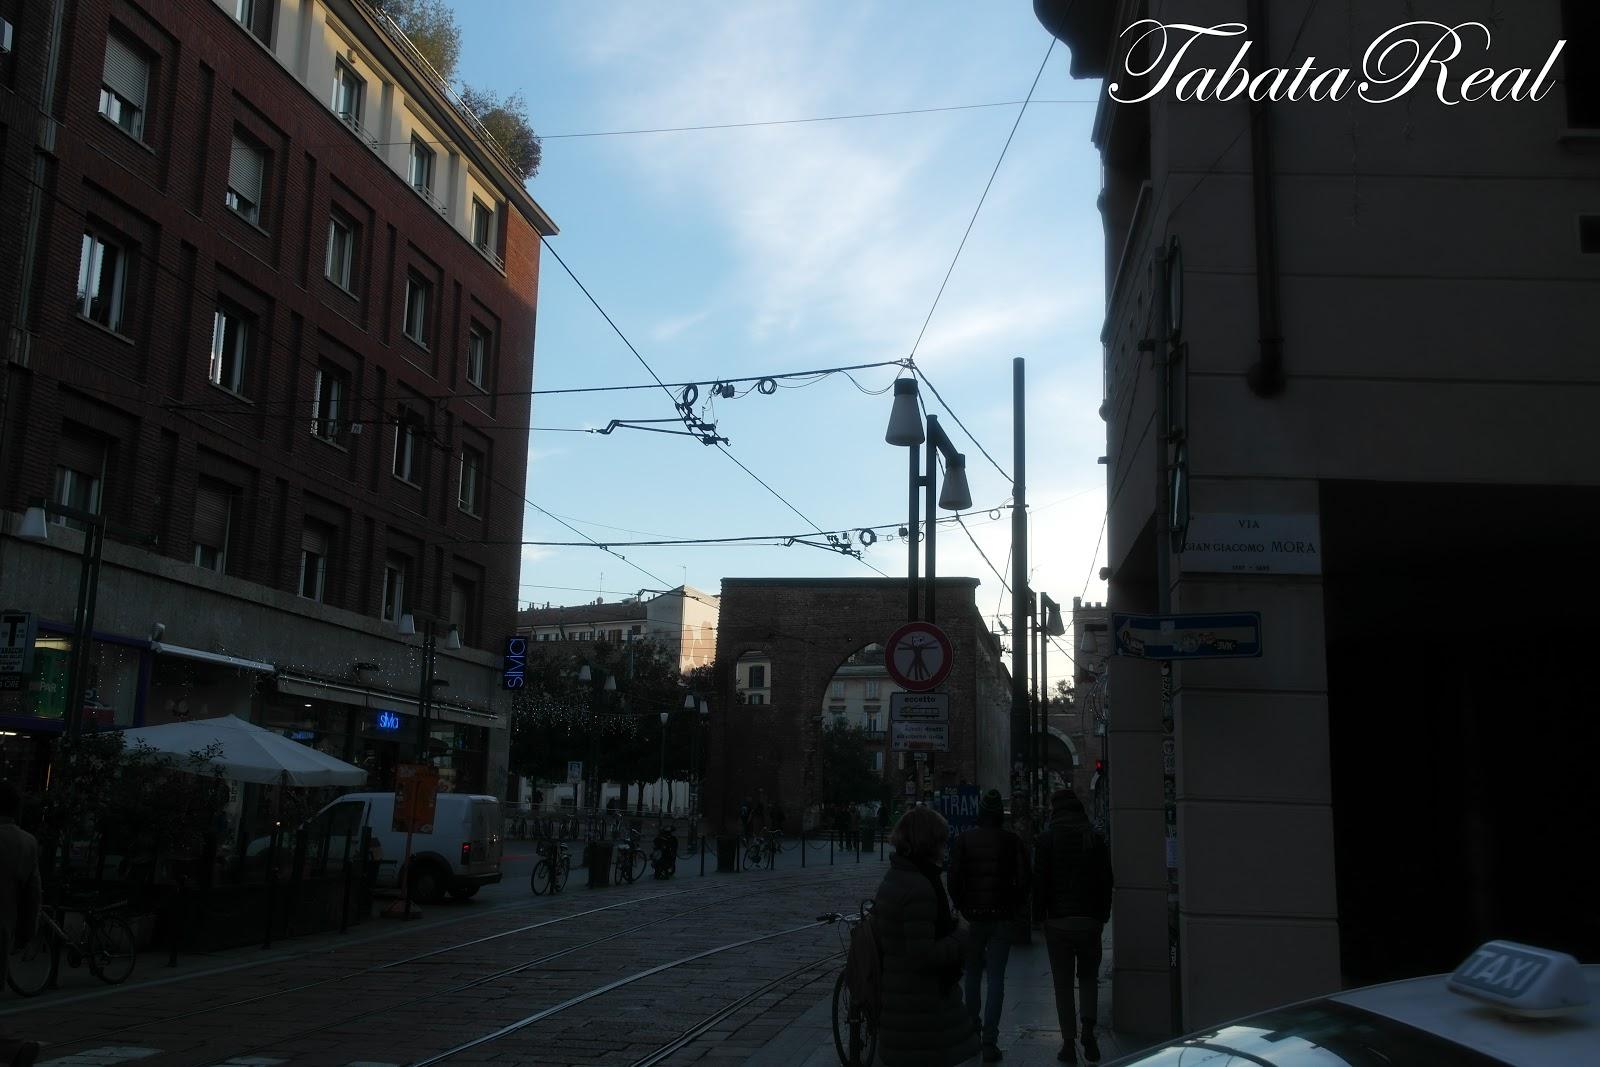 TabataReal Viaje Viaggio a MILANO